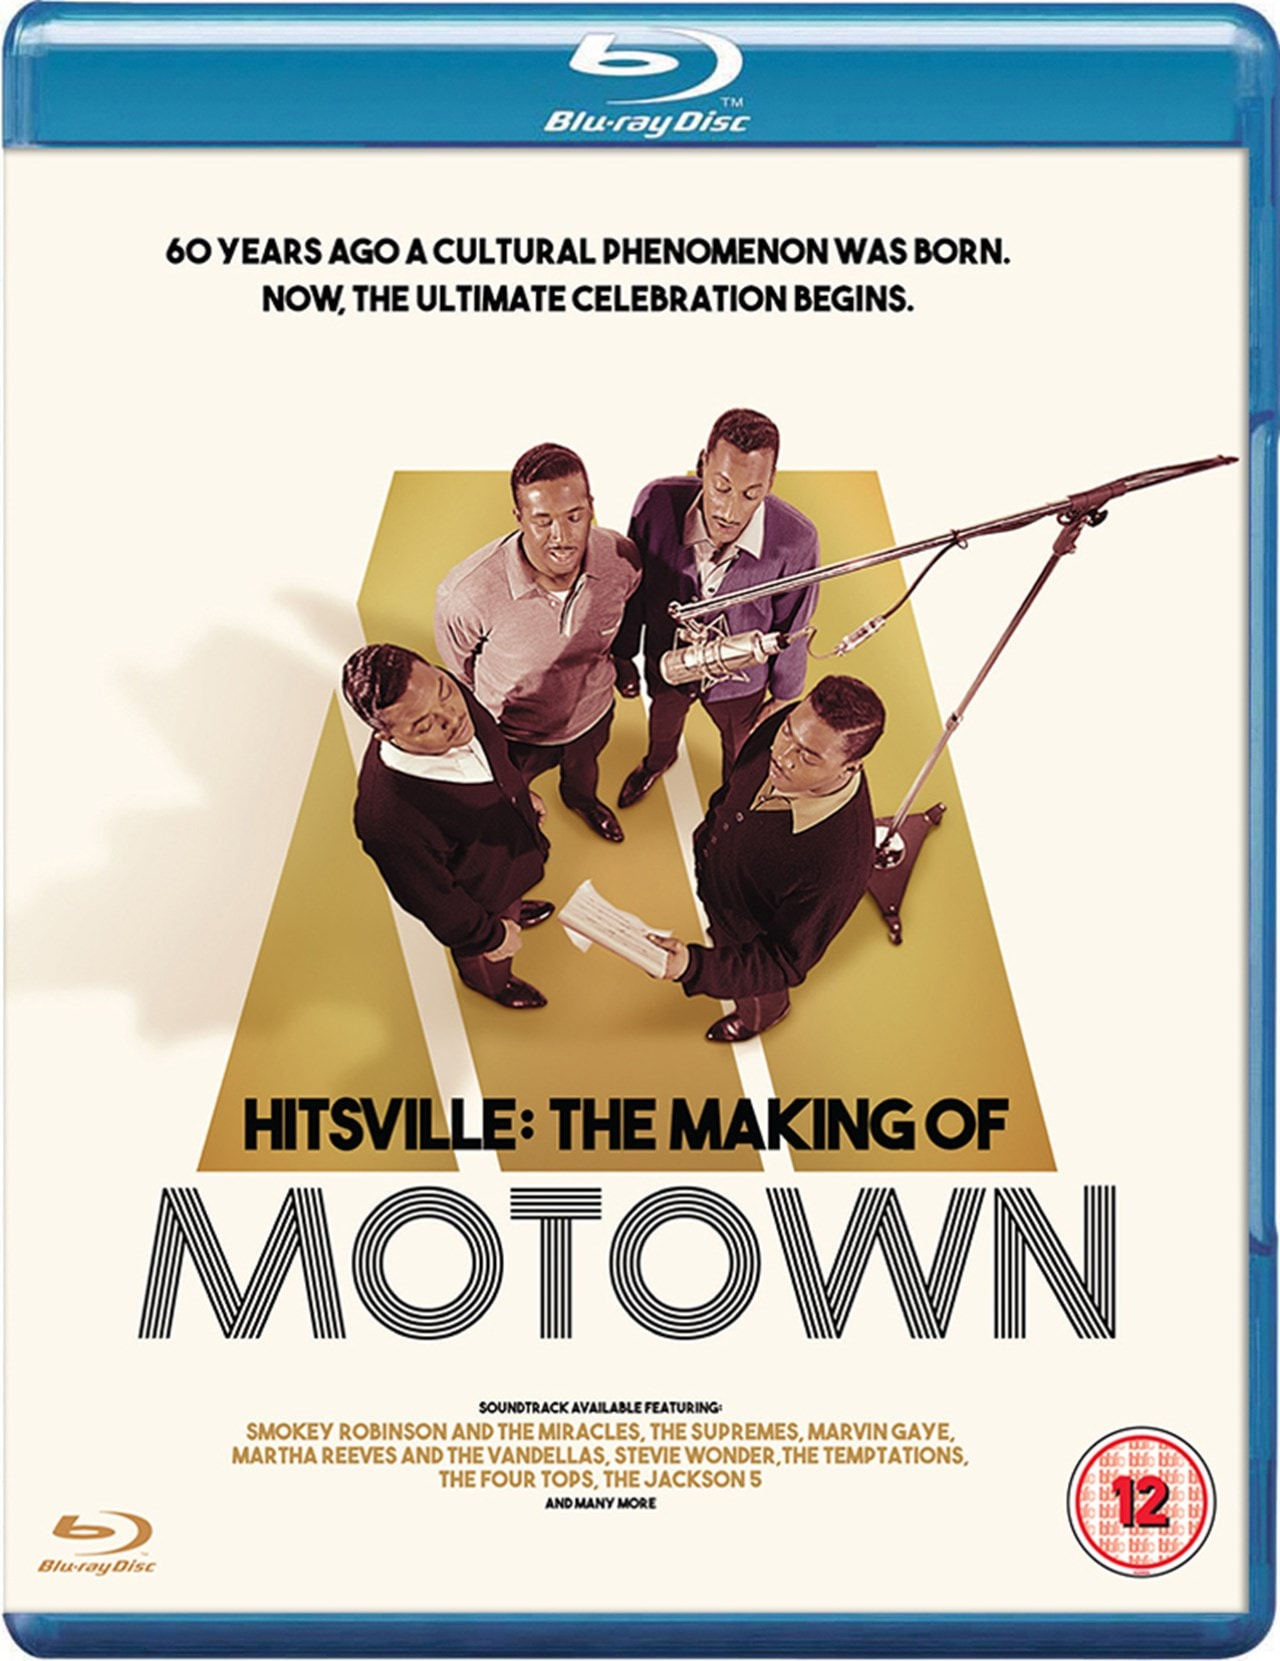 Hitsville - The Making of Motown - 1